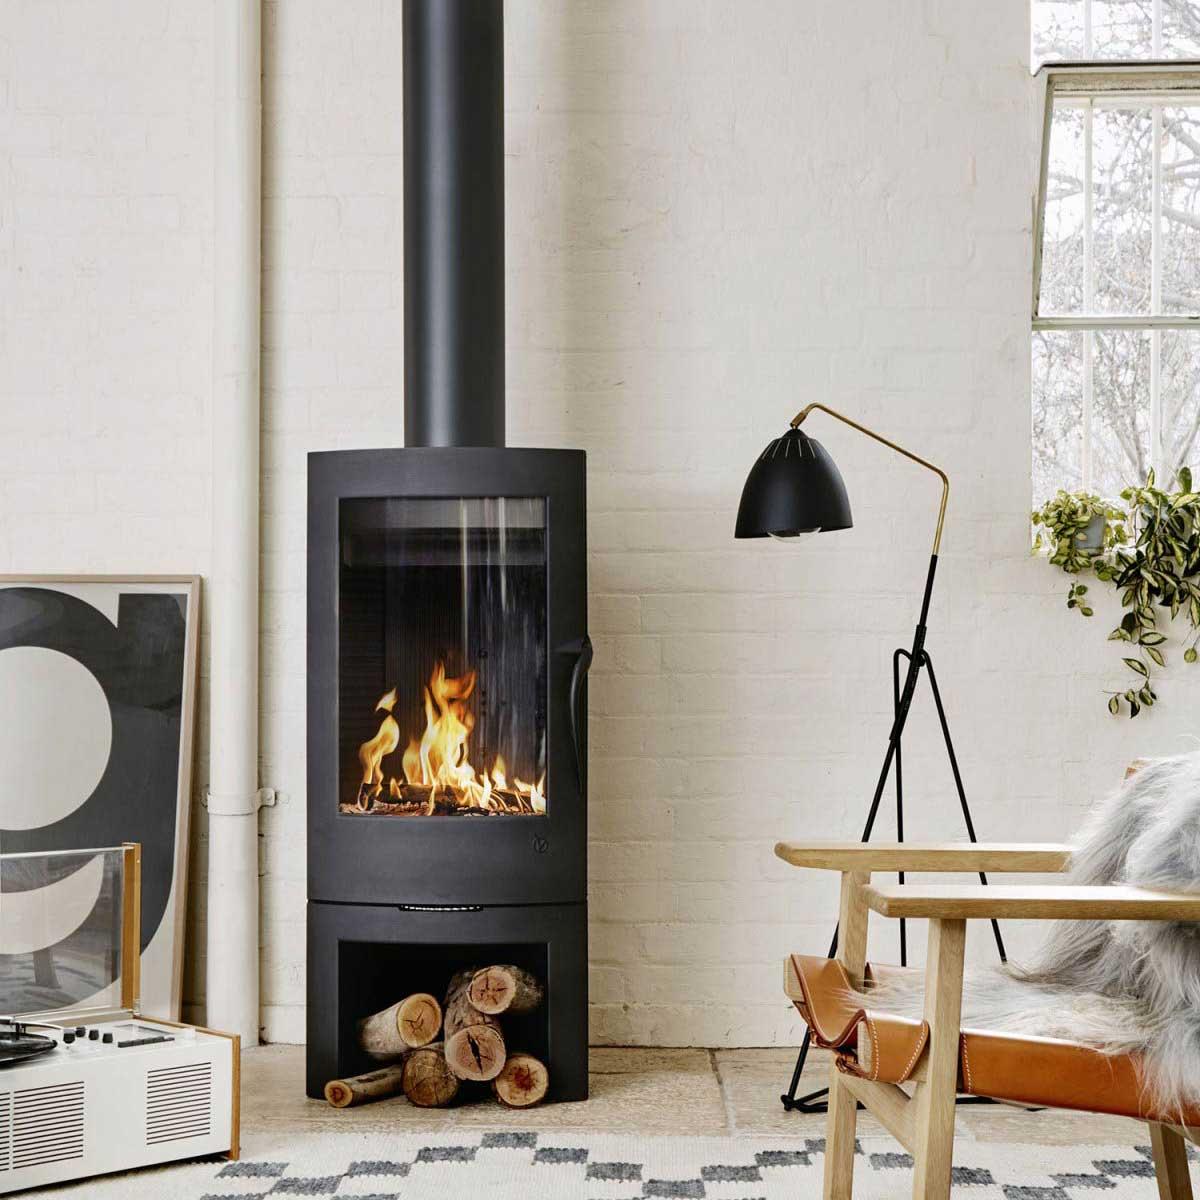 Invicta Argos wood heater in stylish living room